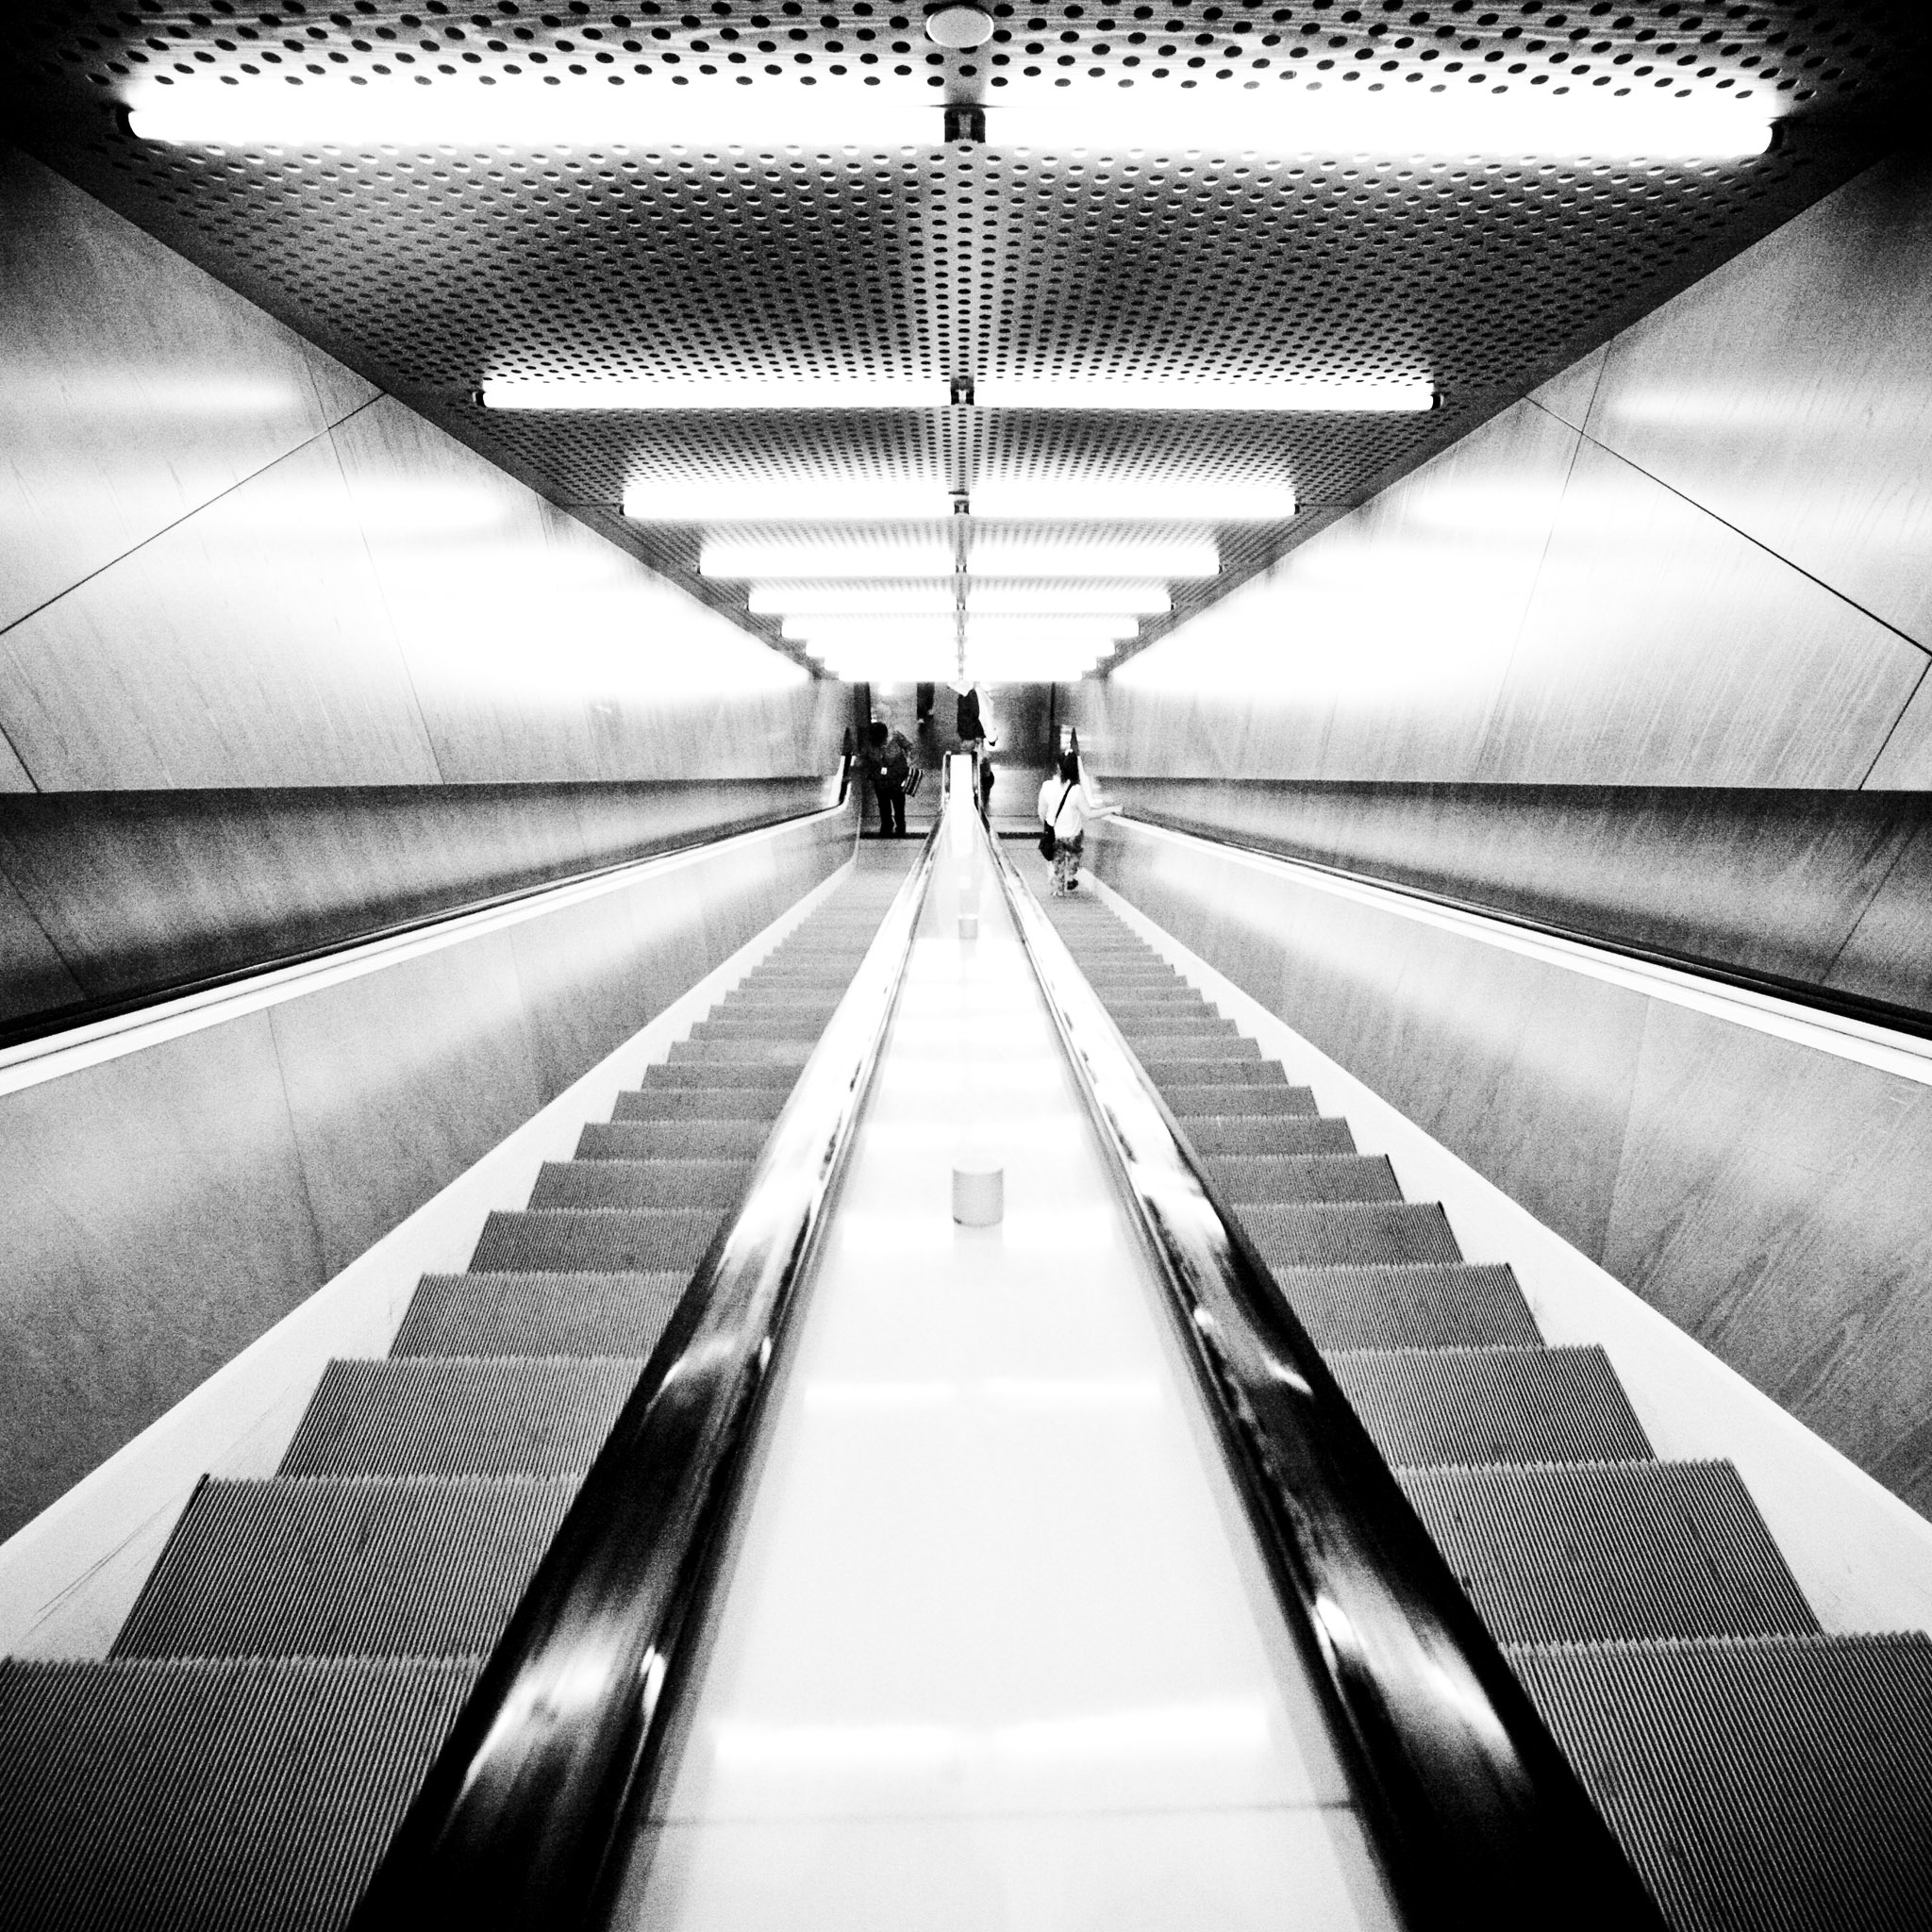 thomas hawk - people in escalator ipad wallpaper